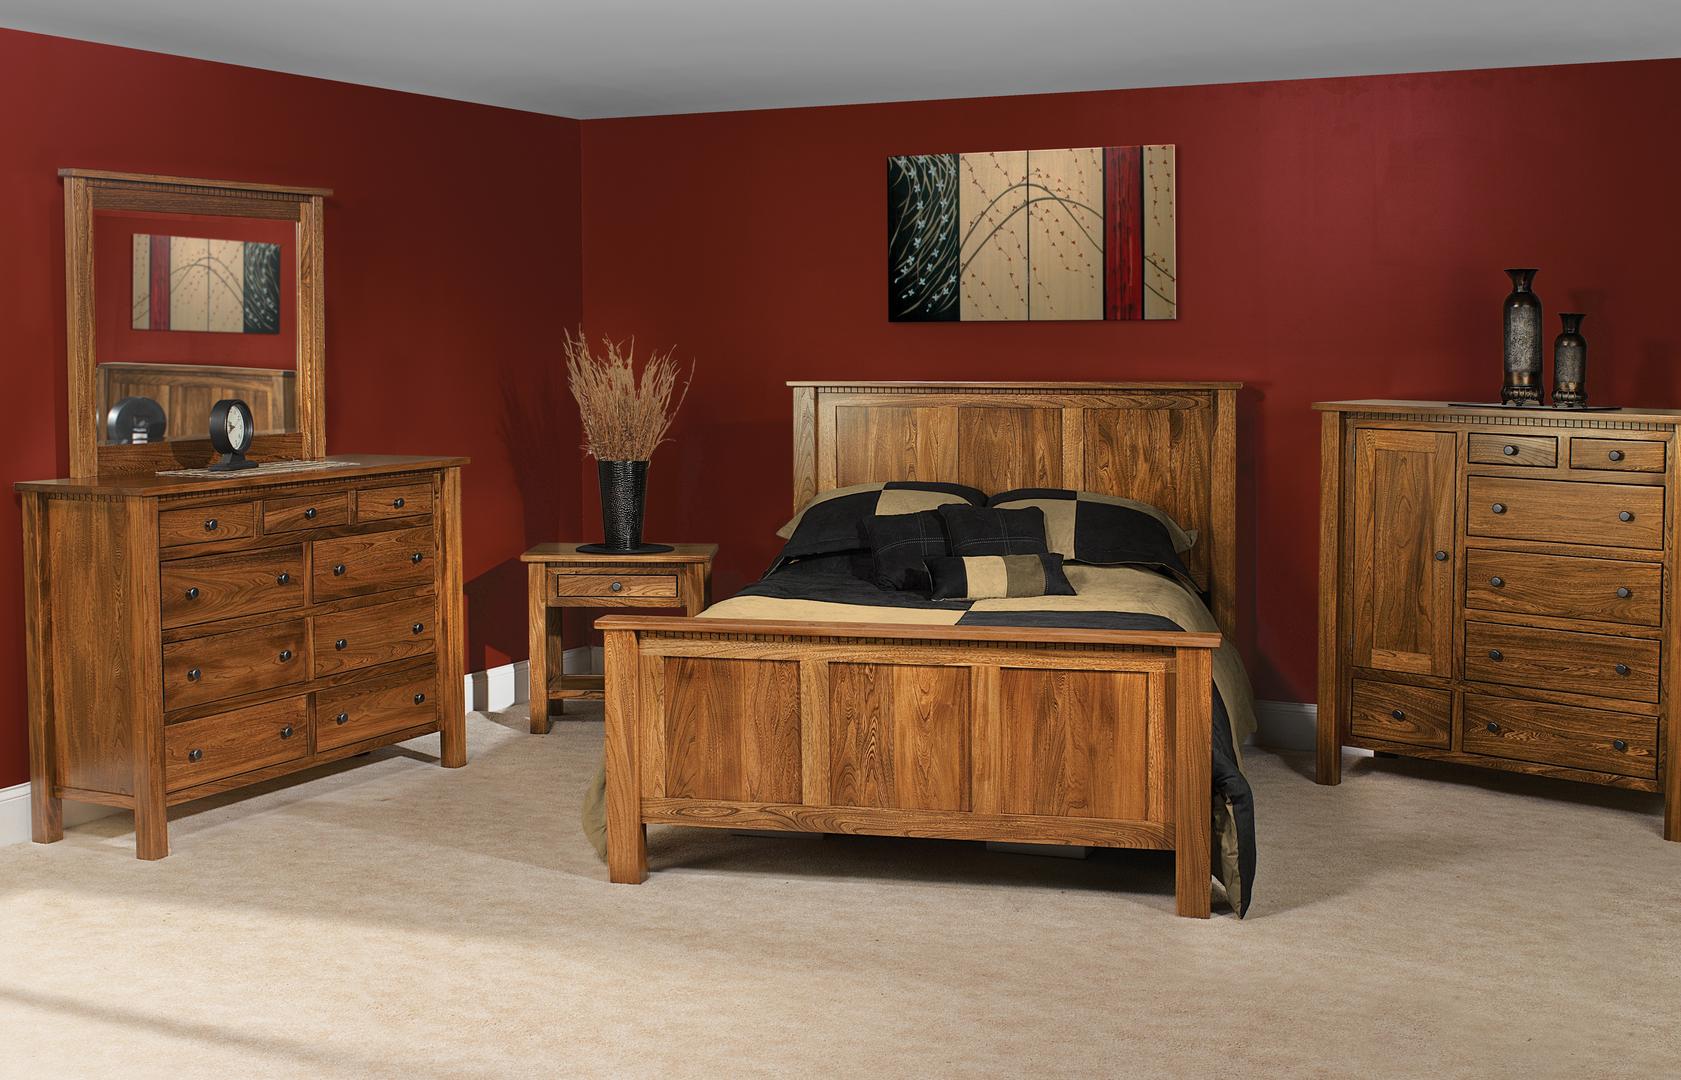 Portland Bedroom Furniture Our Services